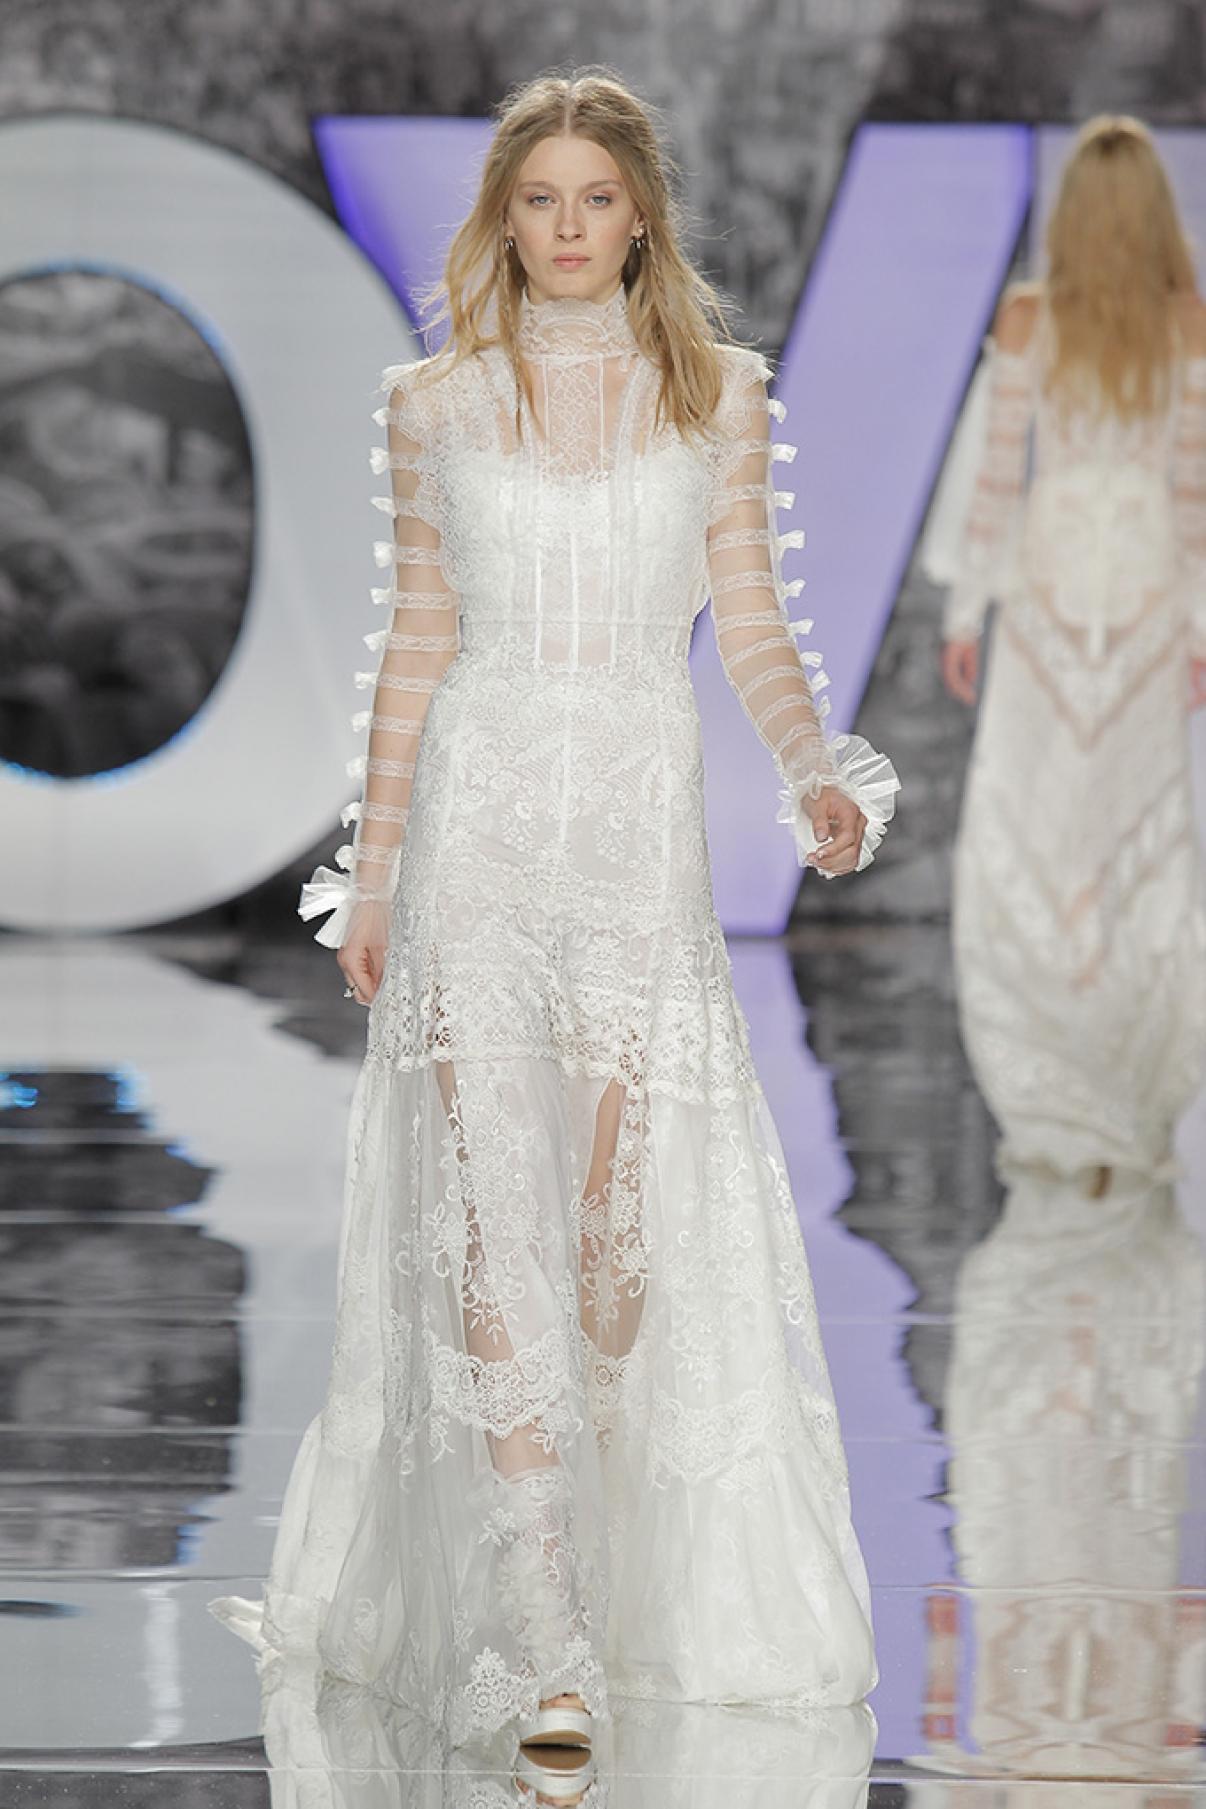 yolancris-weddingdress-bride-boho-chic-folk-wedding-dress-couture-fashion-desing-bohodress-80.jpg